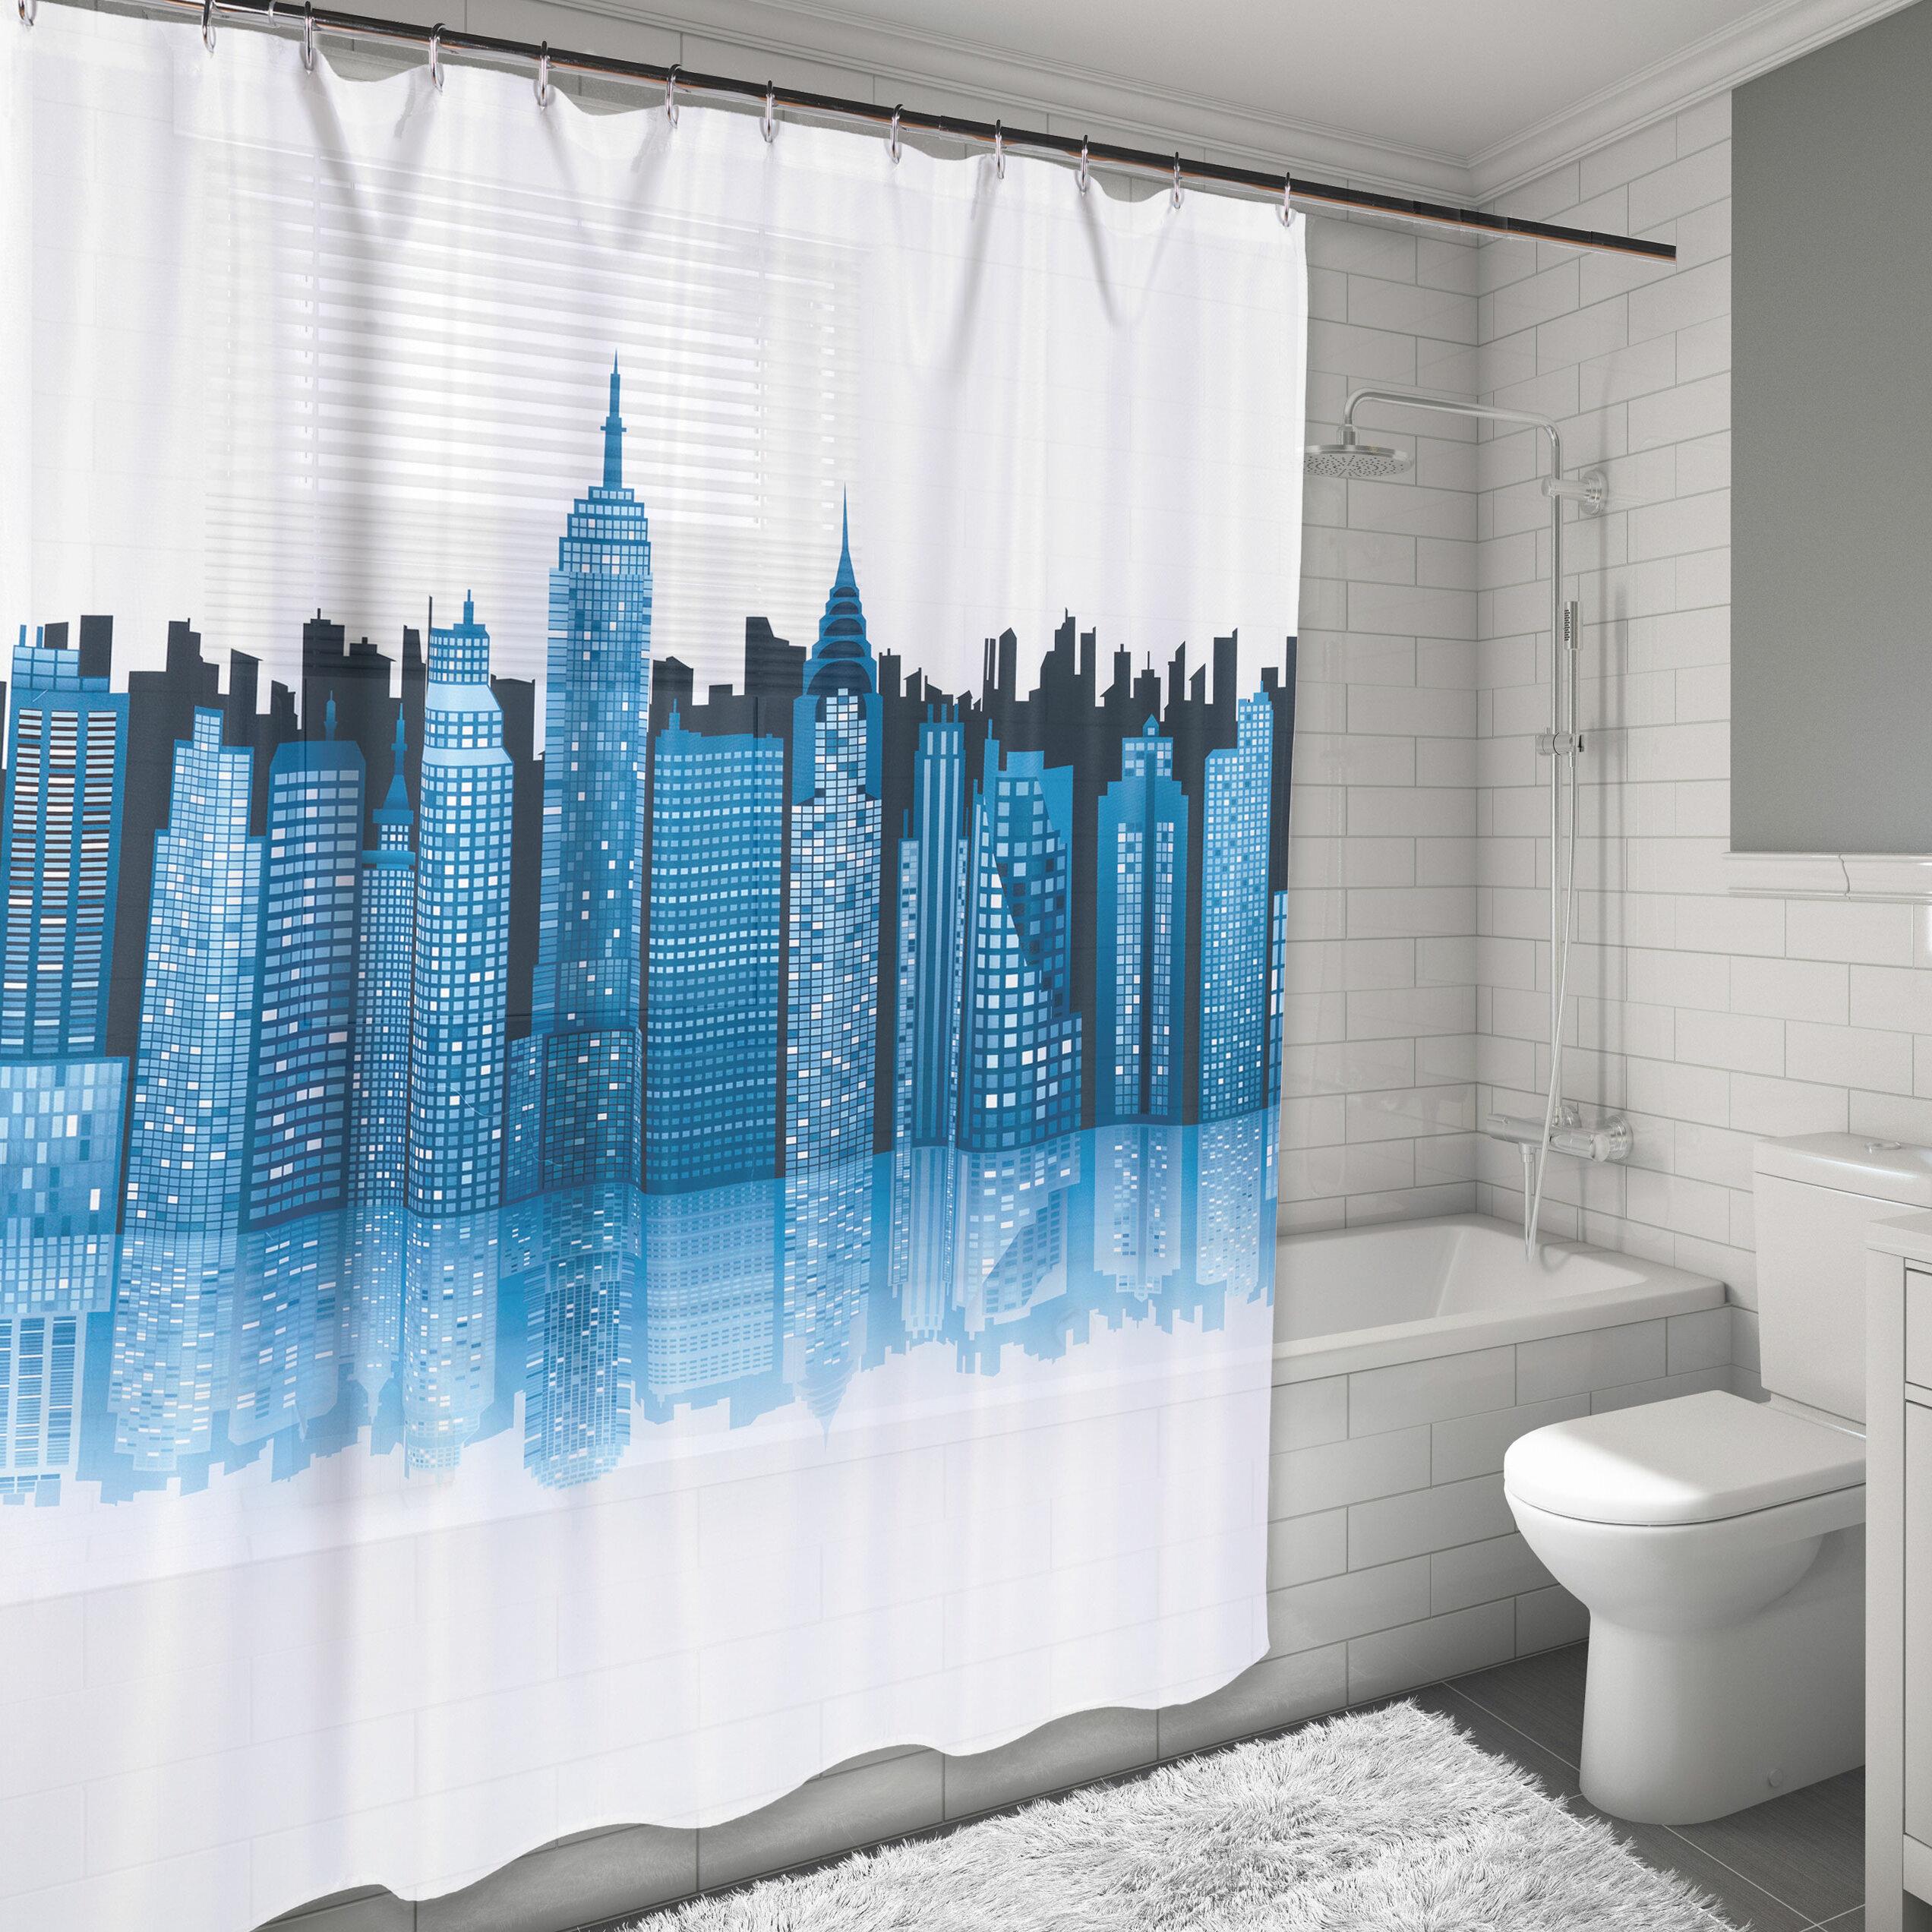 East Urban Home Cityscape Shower Curtain & Reviews | Wayfair